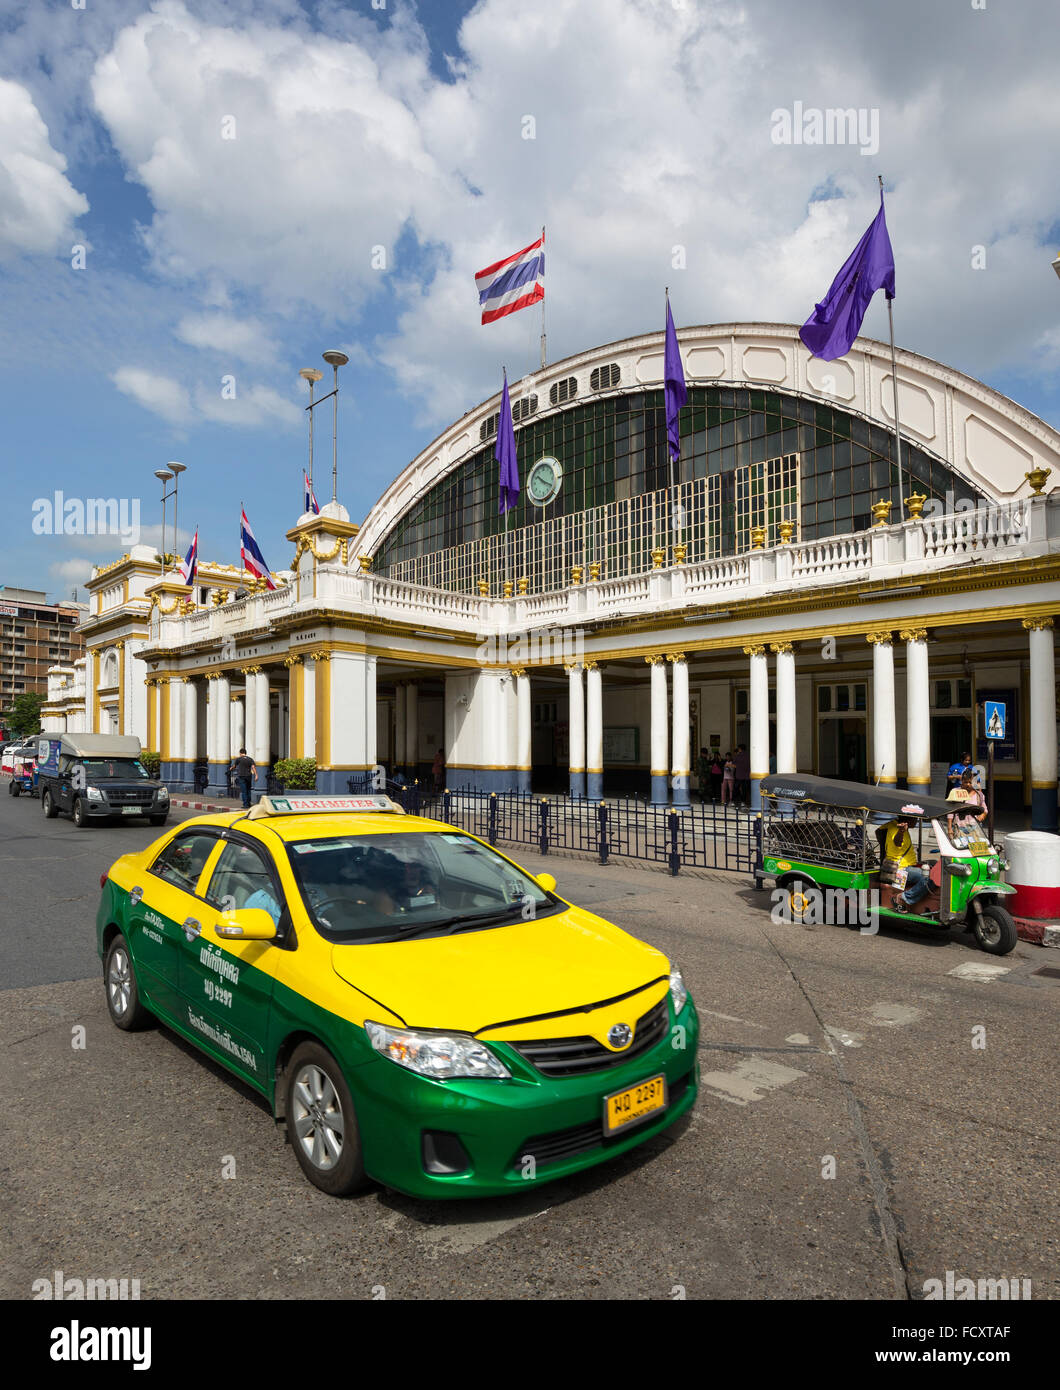 Tuk-tuk et de taxi en face de la gare centrale, la gare de Hua Lamphong, Chinatown, Bangkok, Thaïlande Photo Stock